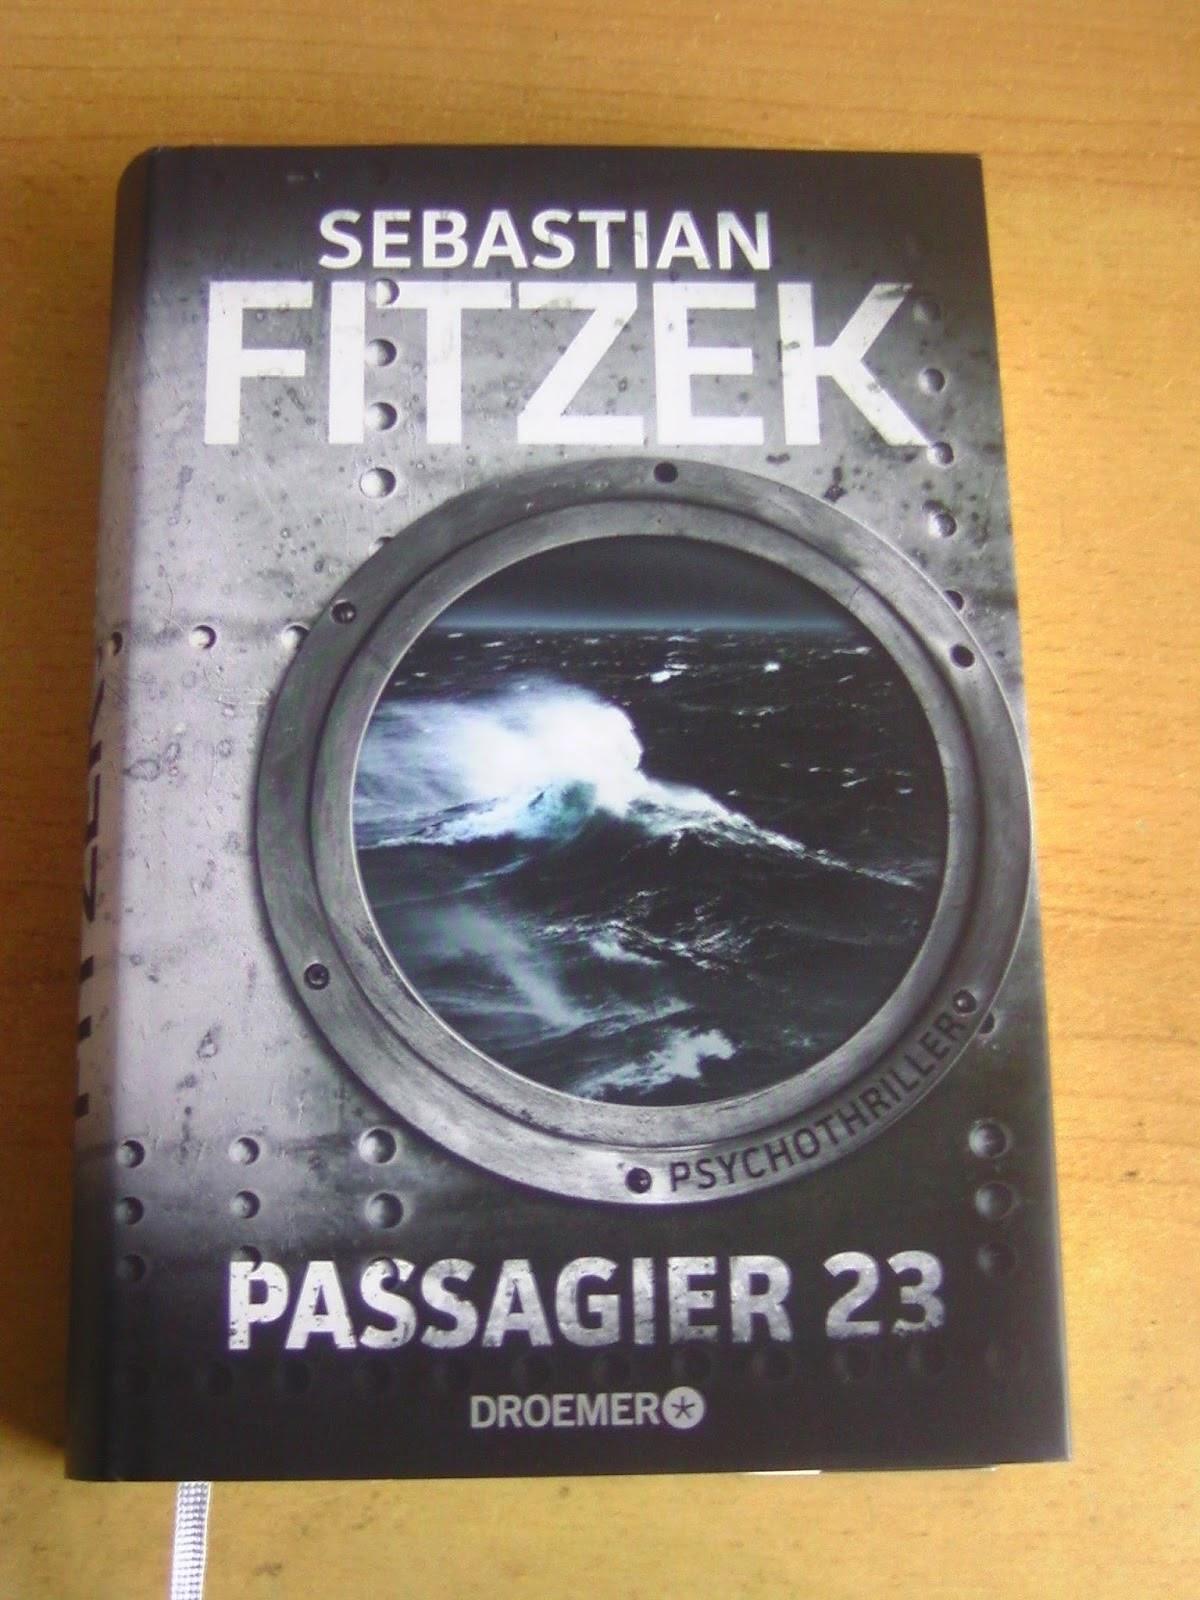 http://www.amazon.de/Passagier-23-Psychothriller-Sebastian-Fitzek/dp/342619919X